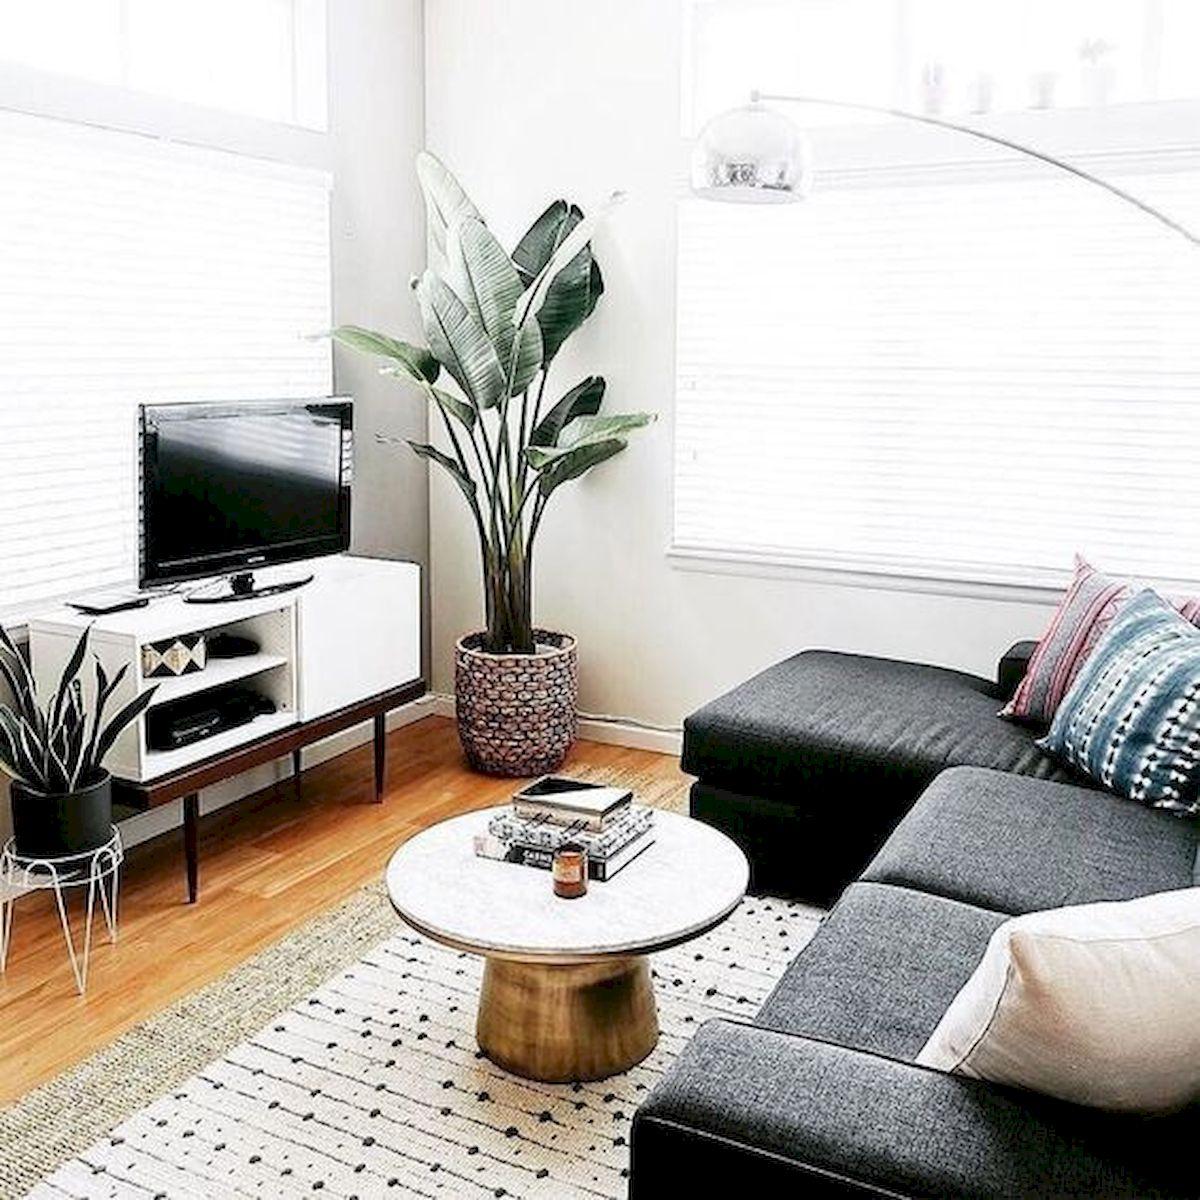 45 Brilliant DIY Living Room Design and Decor Ideas for Small Apartment (1)